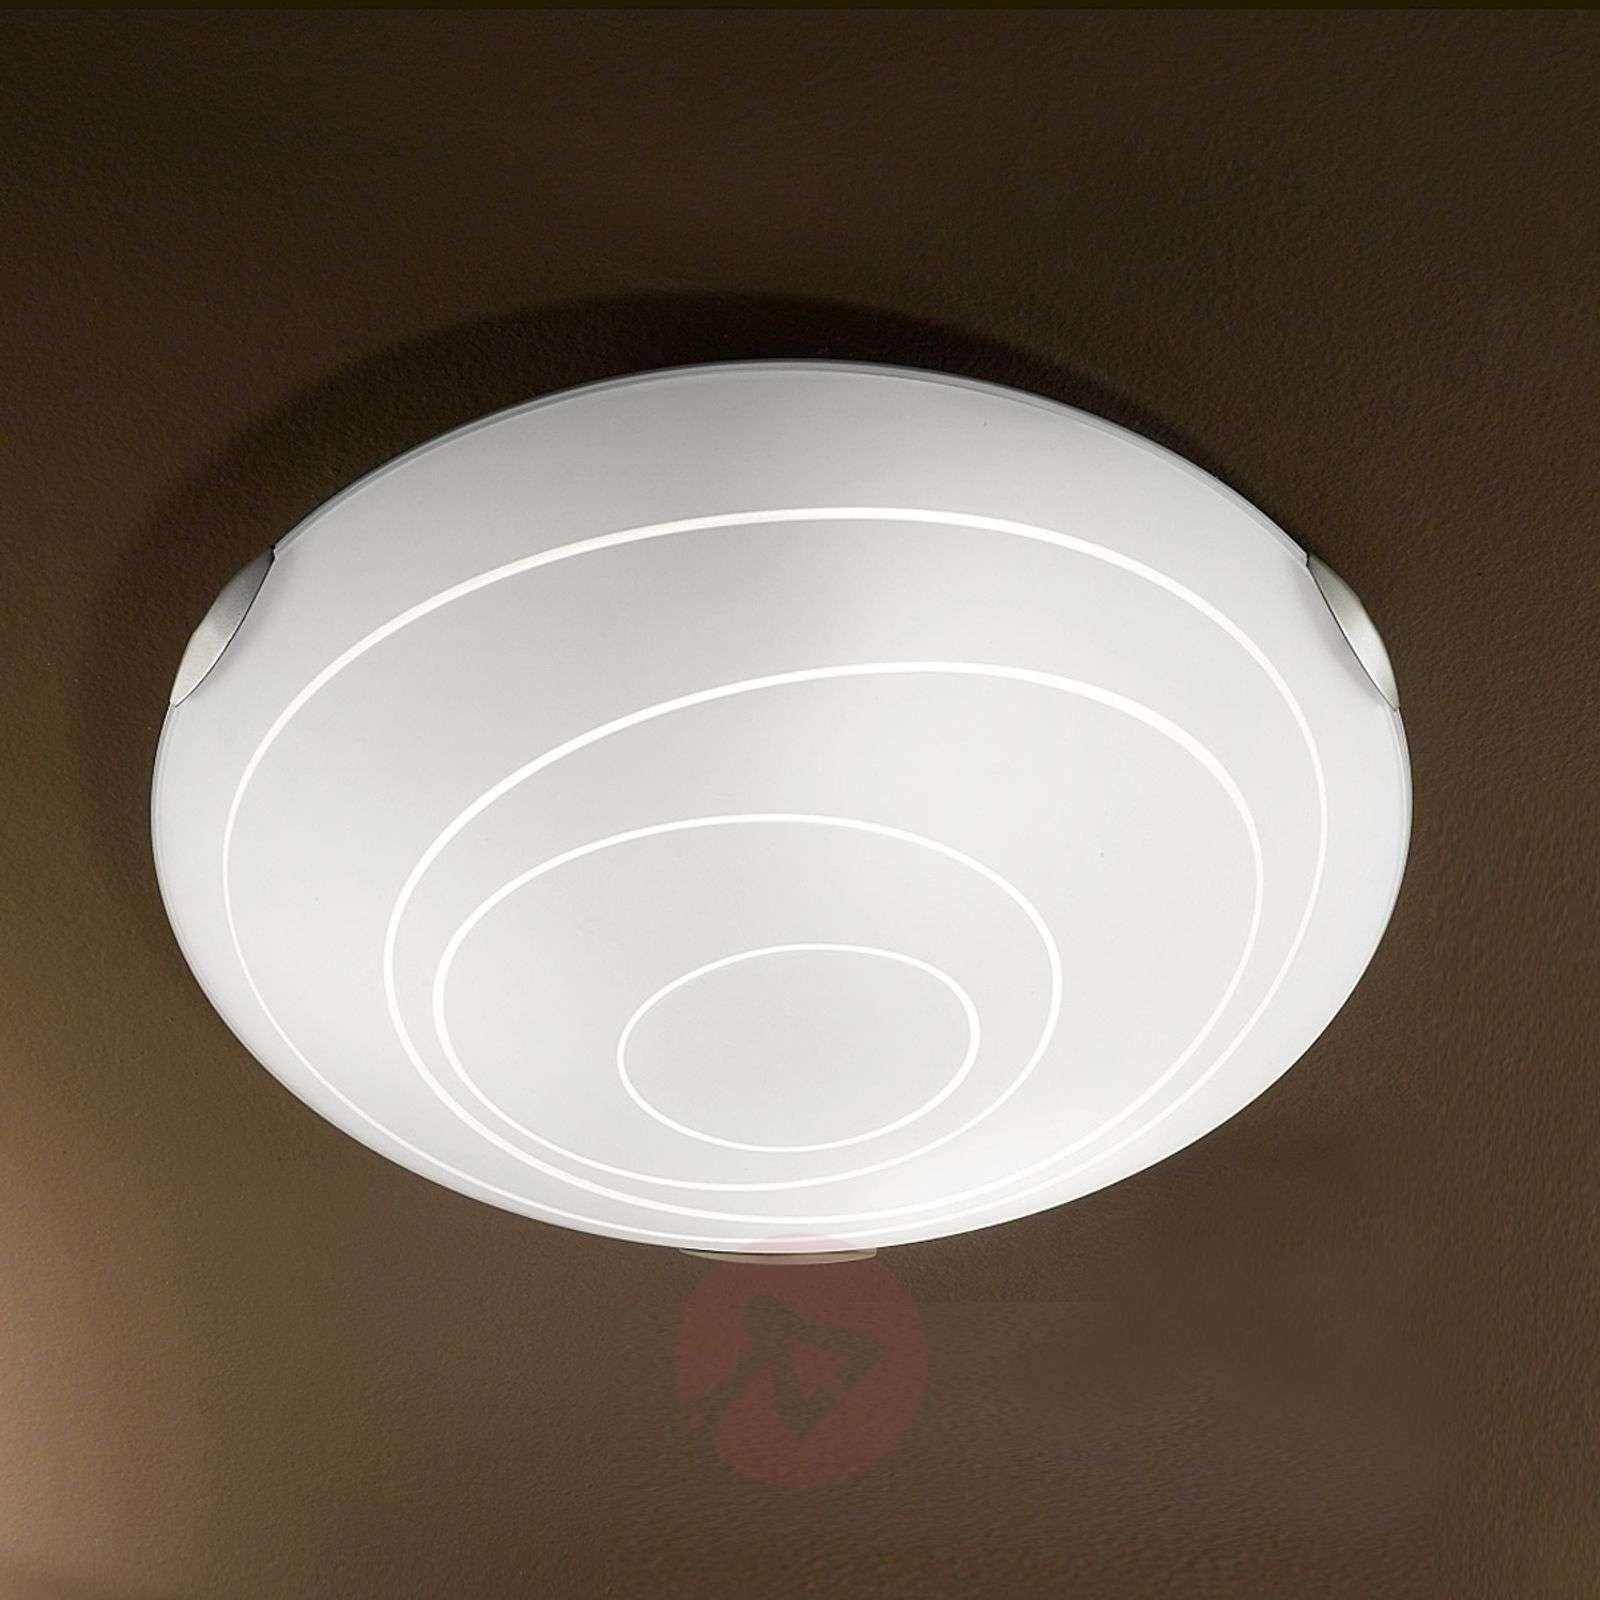 Kent Ceiling Light Round White-3502199-01